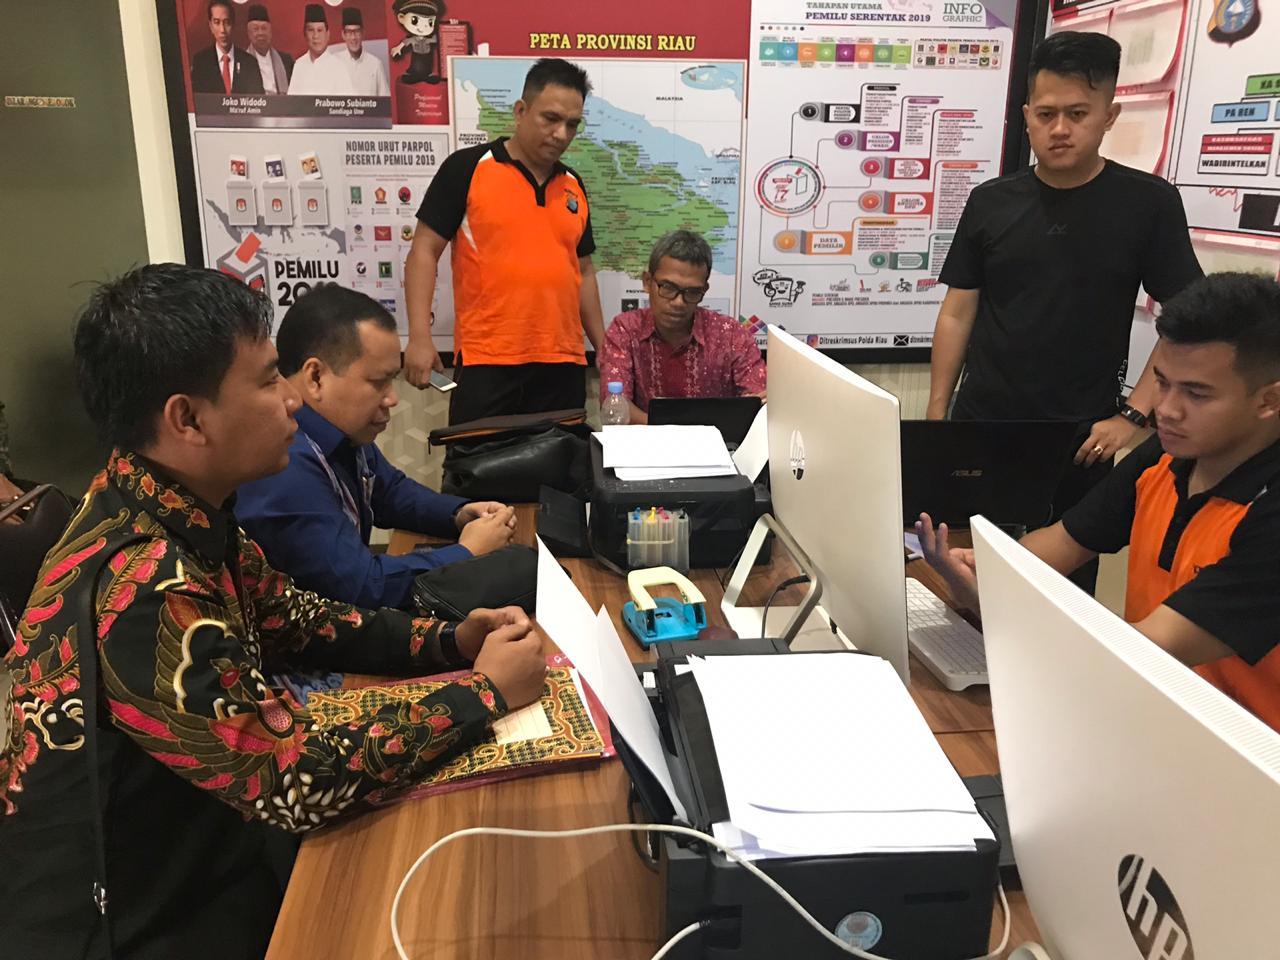 Bupati Meranti Laporkan Akun Facebook Yanti Susi ke Polda Riau